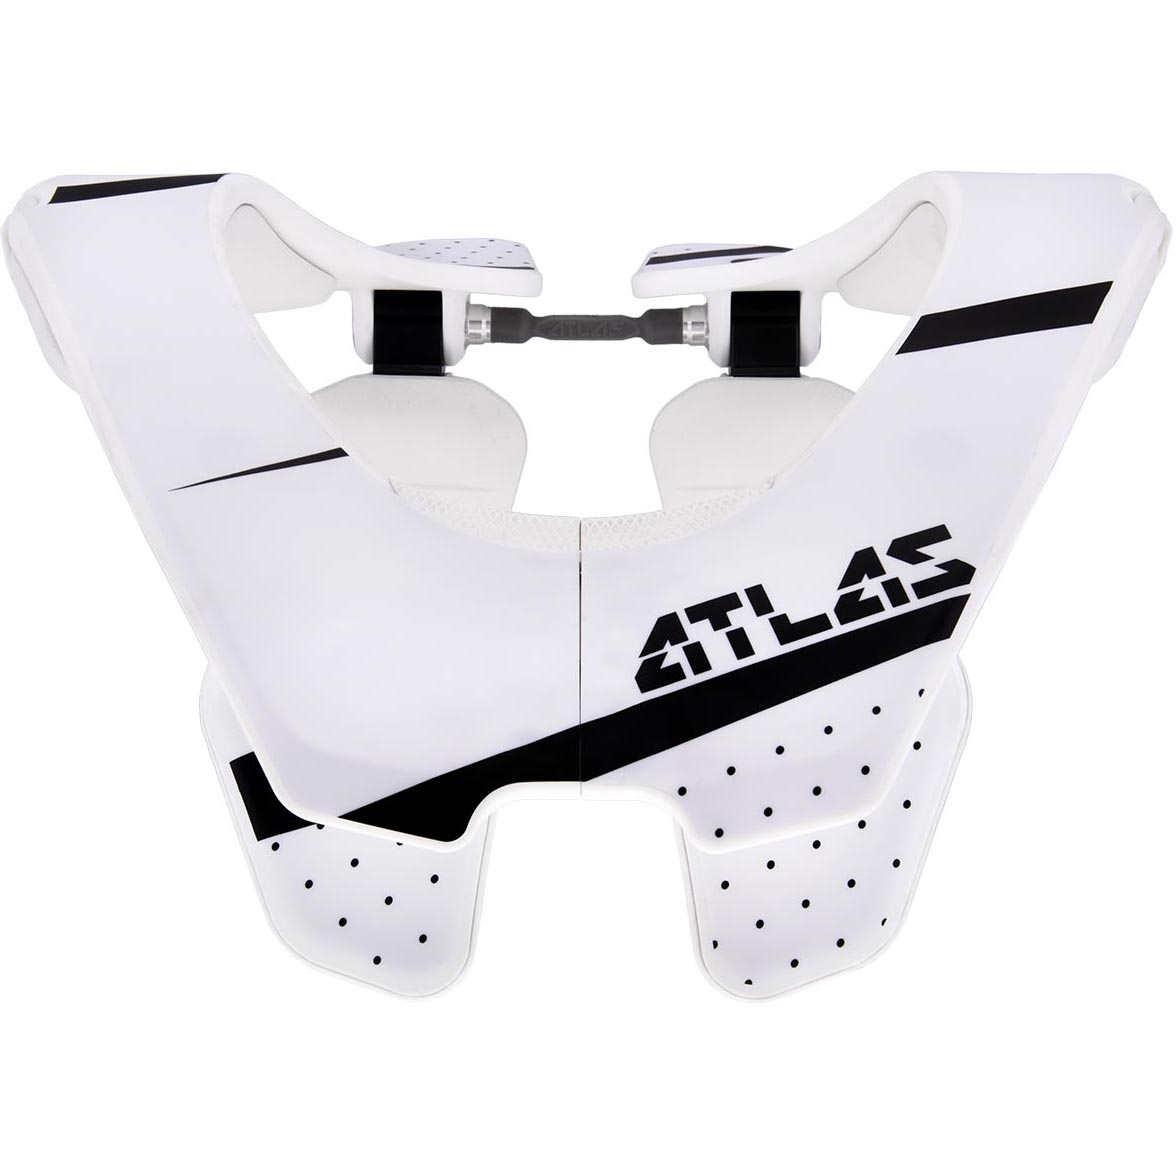 Atlas - Air Trooper защита шеи, бело-черная